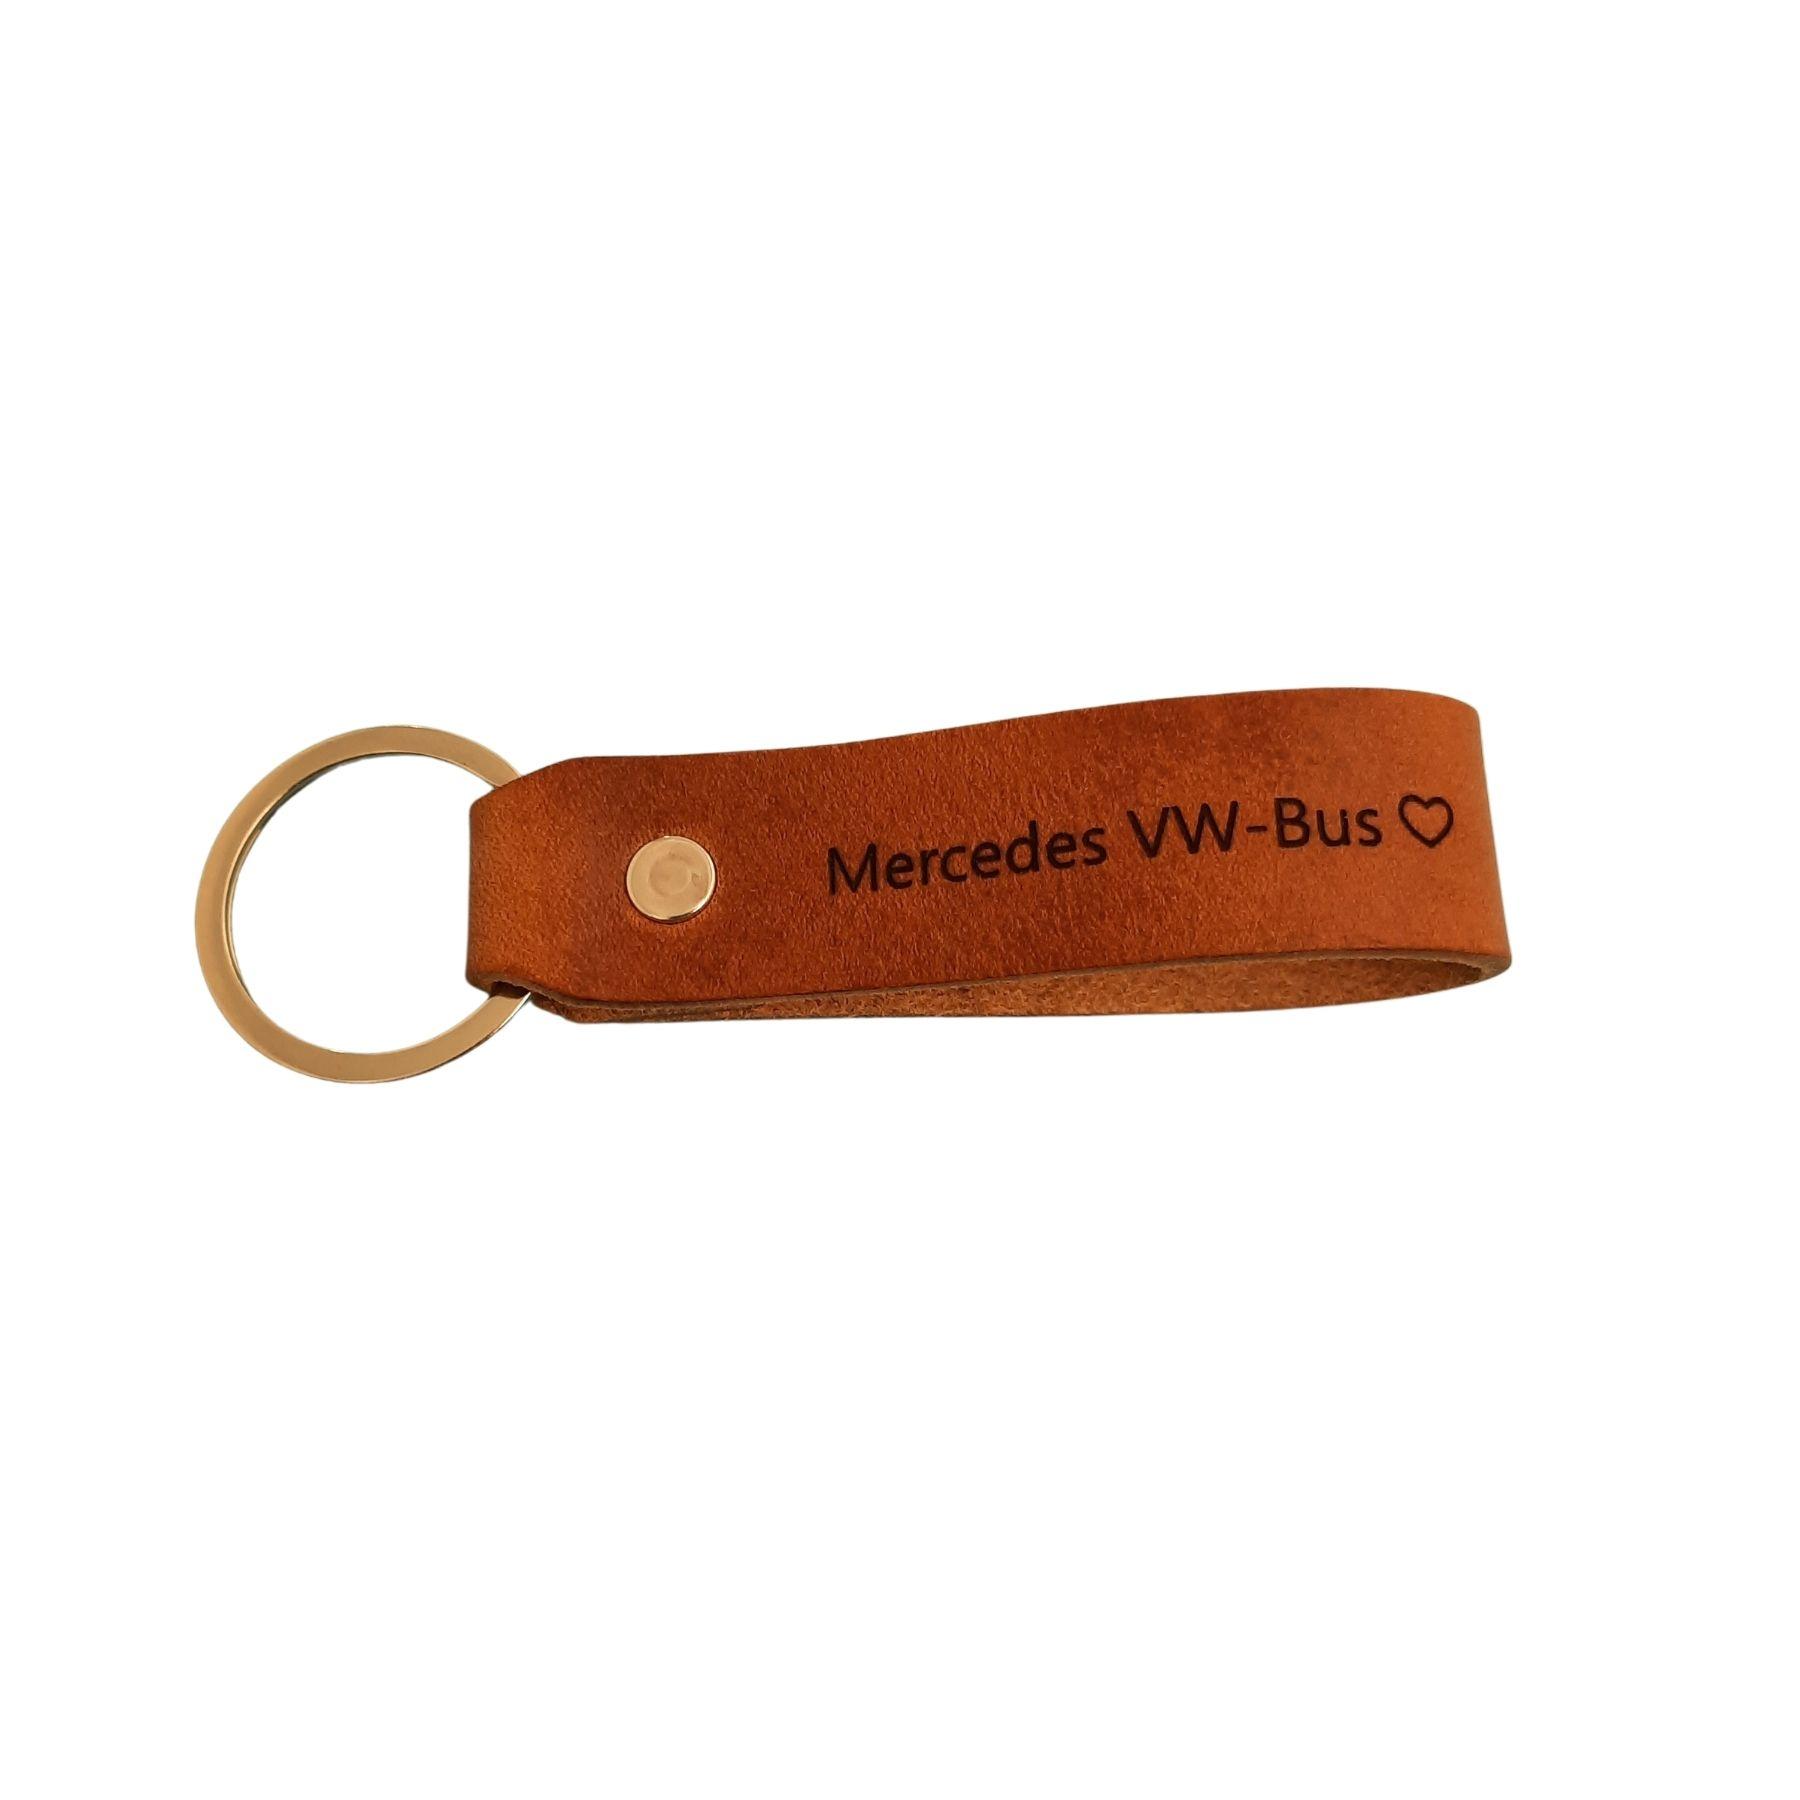 Leder Schlüsselanhänger hell aus Allgäu-Rindleder mit Wunschtext